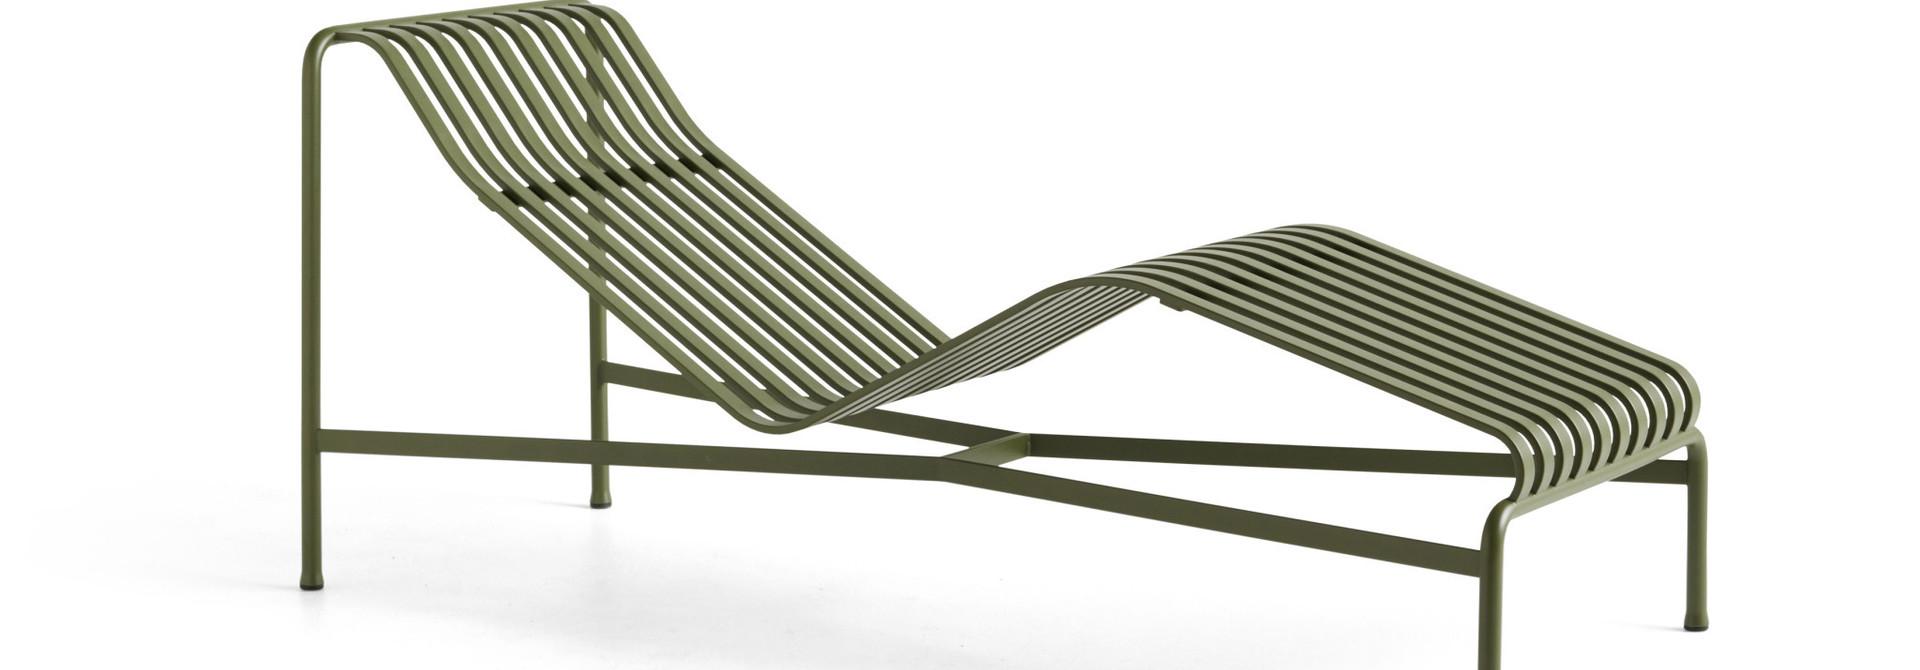 Palissade Chaise longue